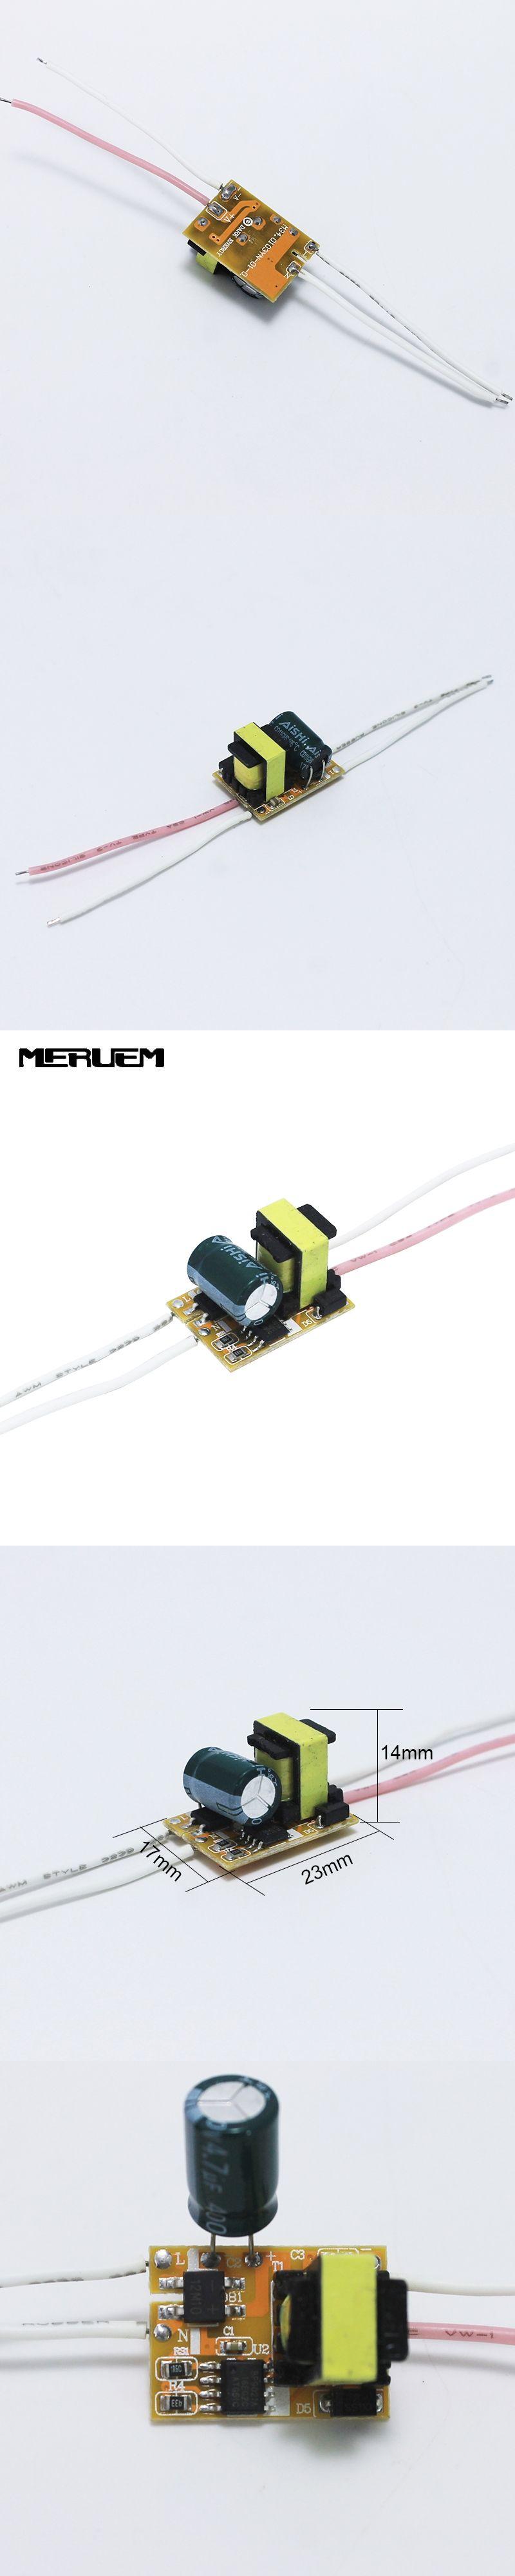 Free Shipping 1 3x 1w 3x1w Led Driver 2w 3w Lamp Power Circuit